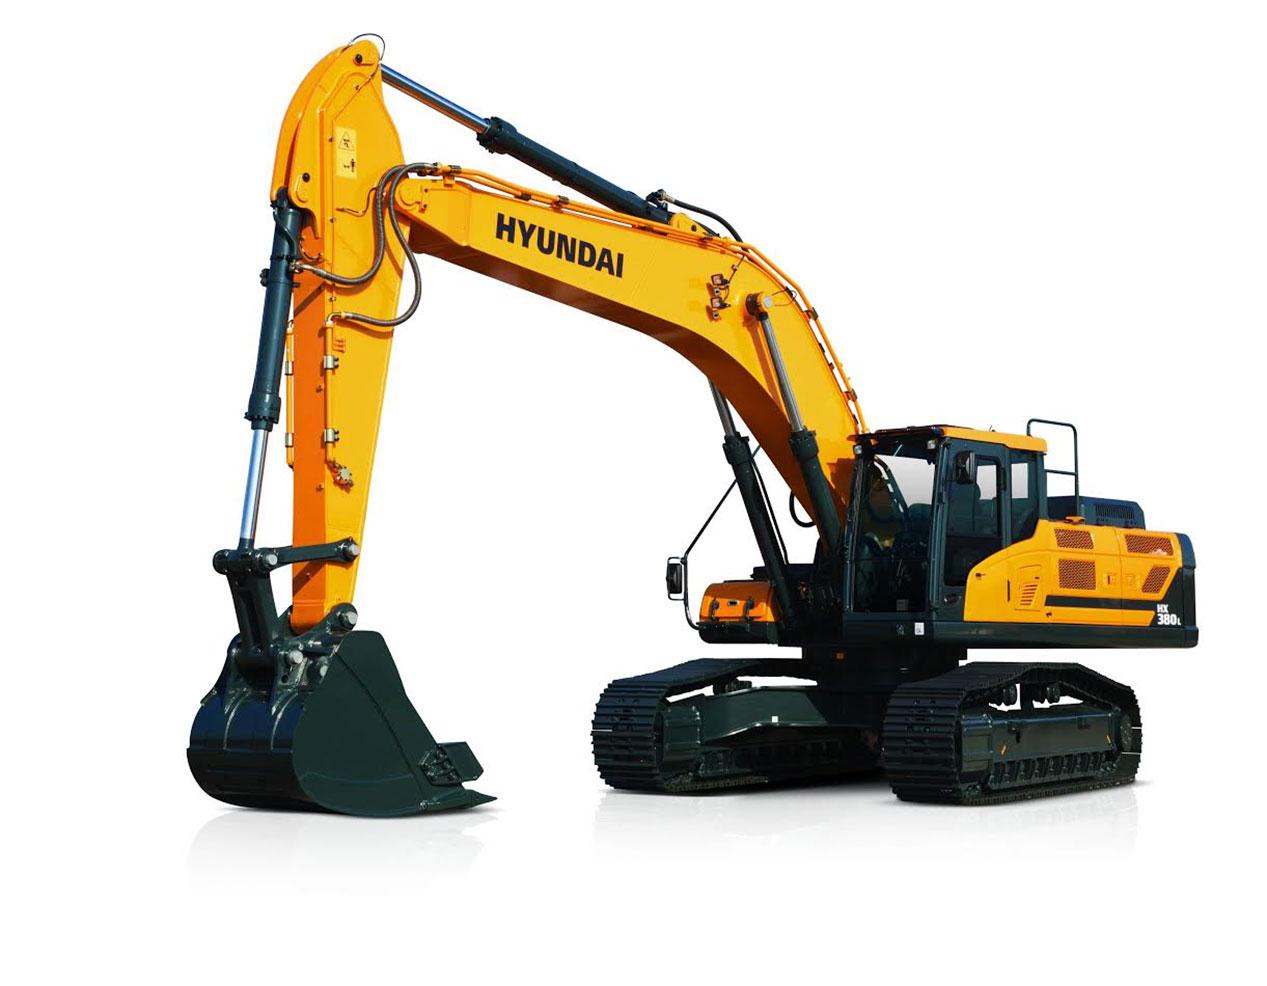 escavatore Hyundai serie HX 954b724b-a7e5-4902-929e-2d3b1f8f38d7